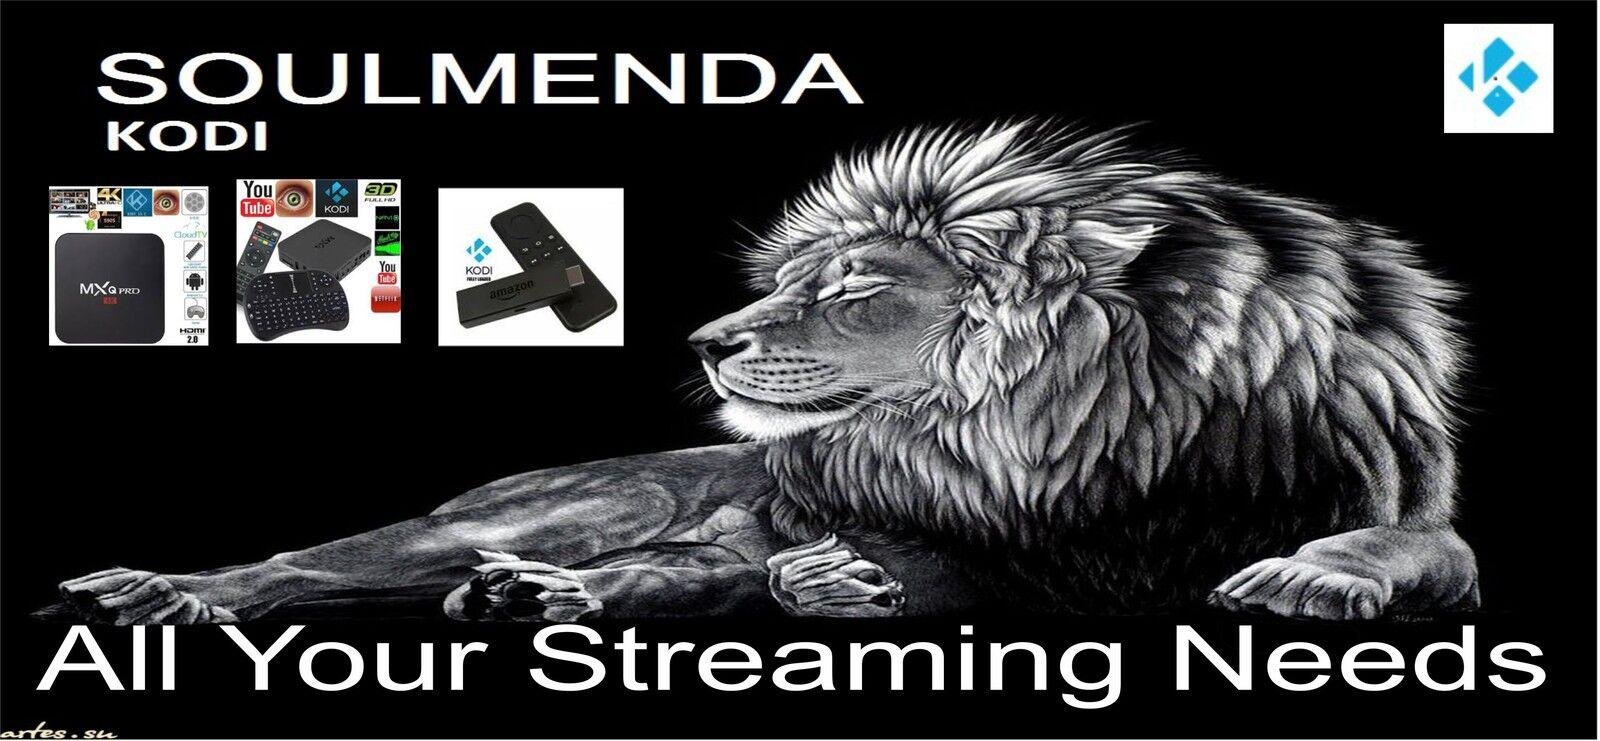 Soulmenda Streaming